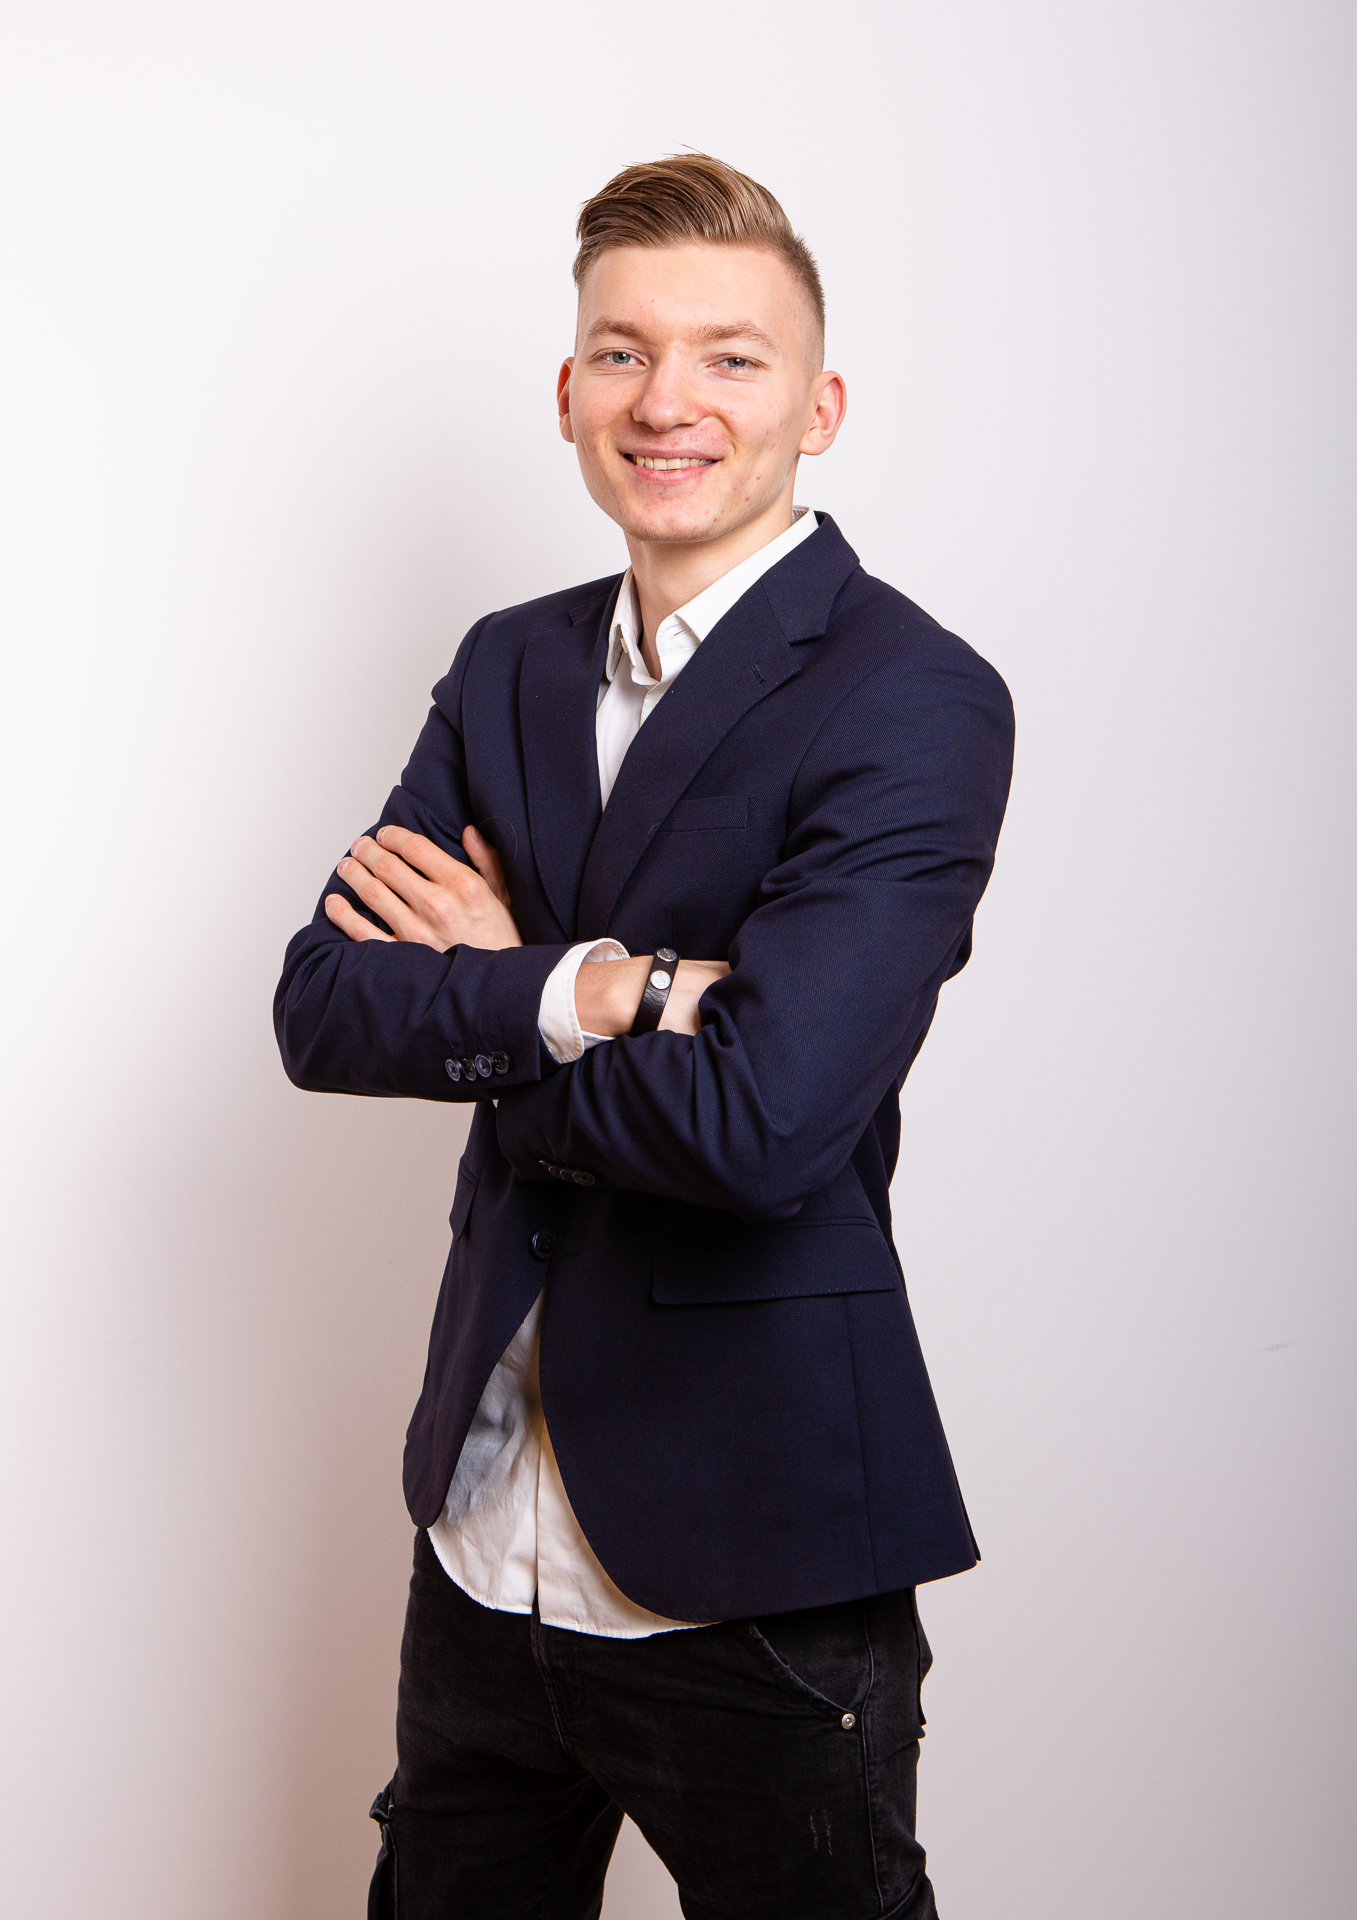 Tim Voigt